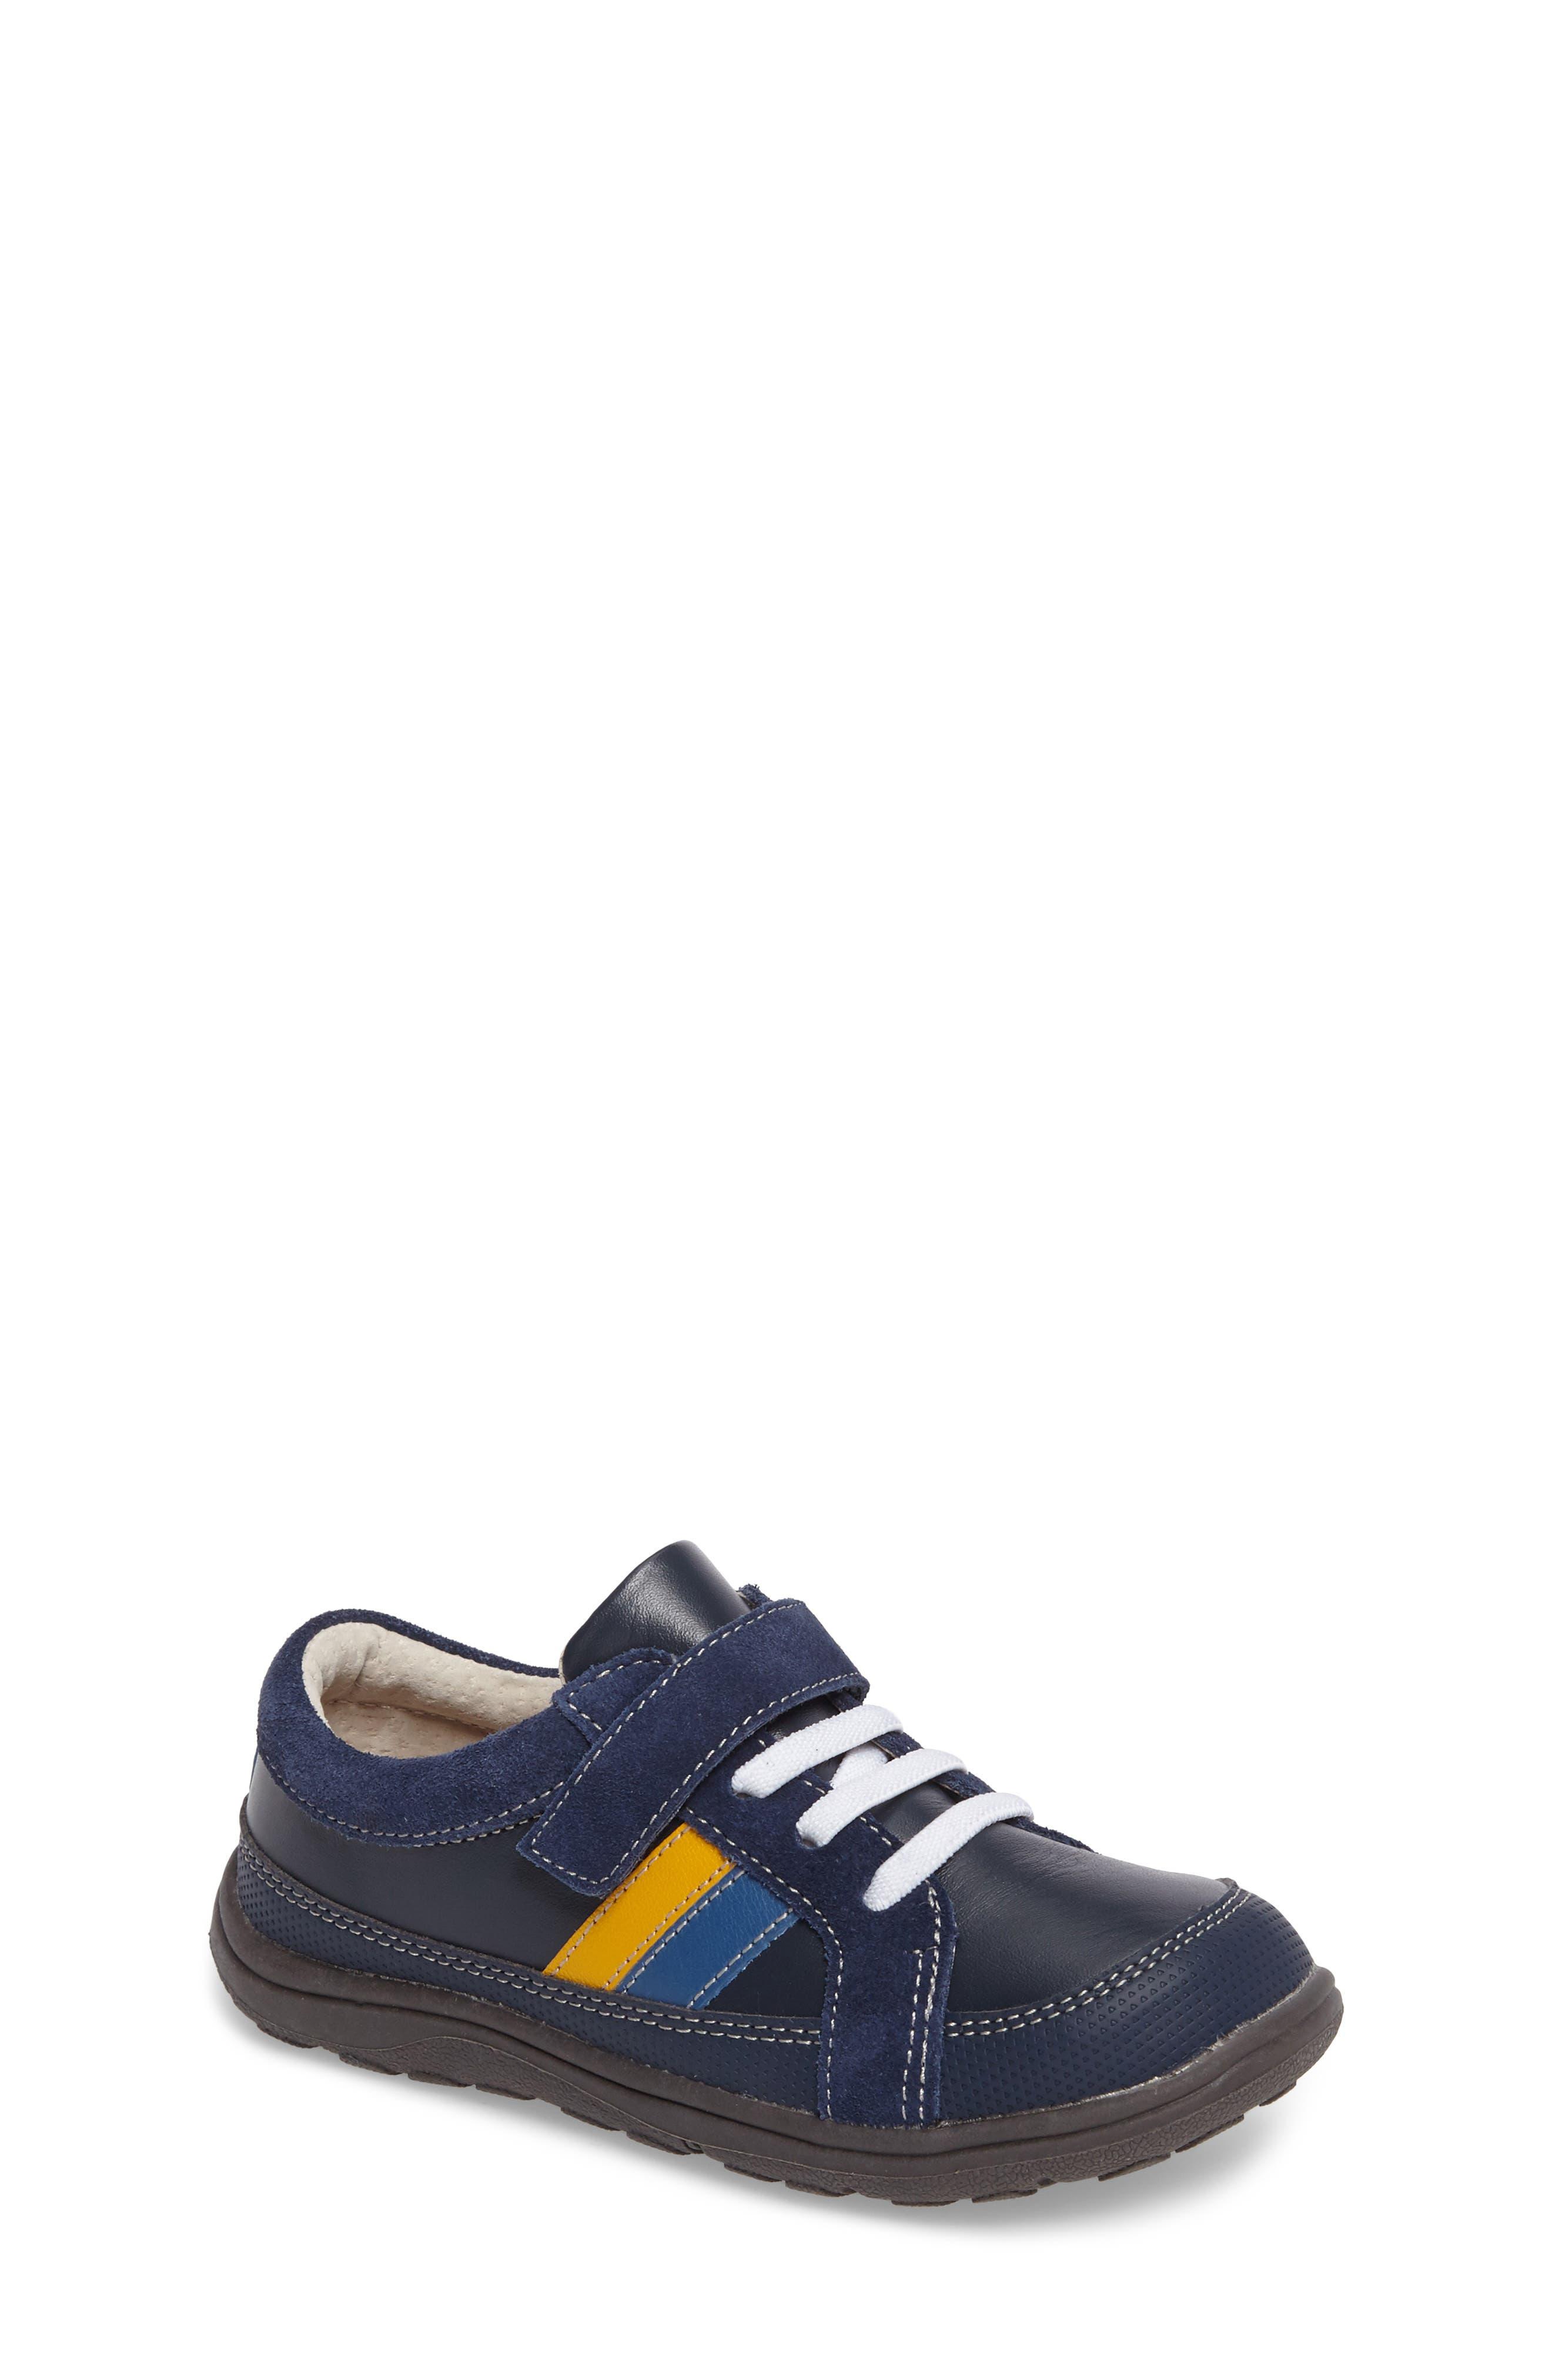 'Randall' Sneaker,                         Main,                         color, Navy